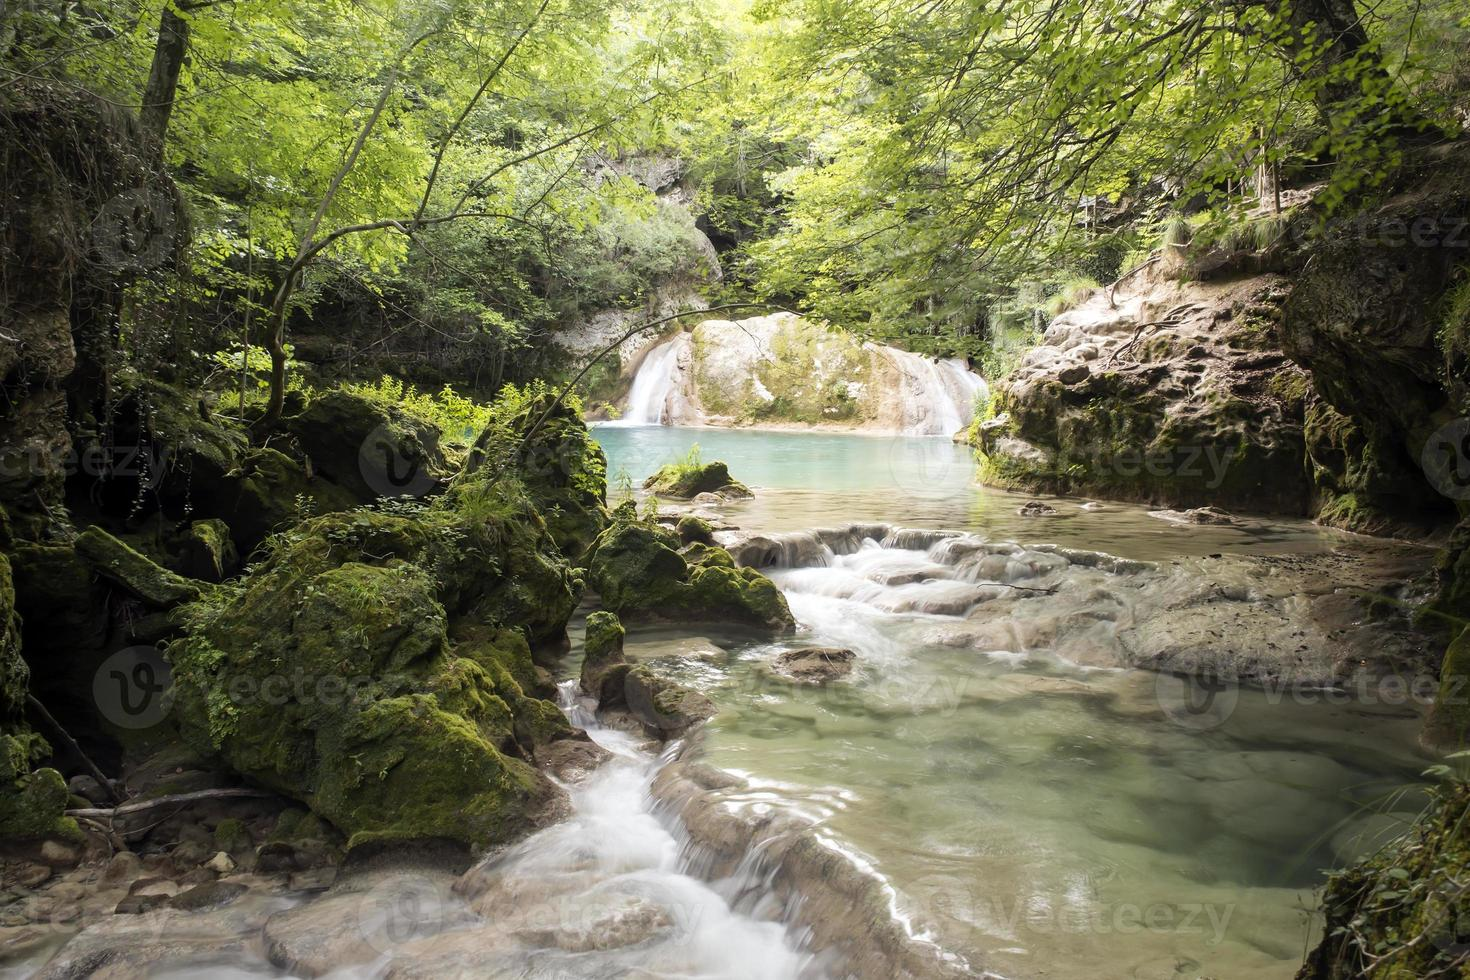 urredera River - Navarra, Spanien foto